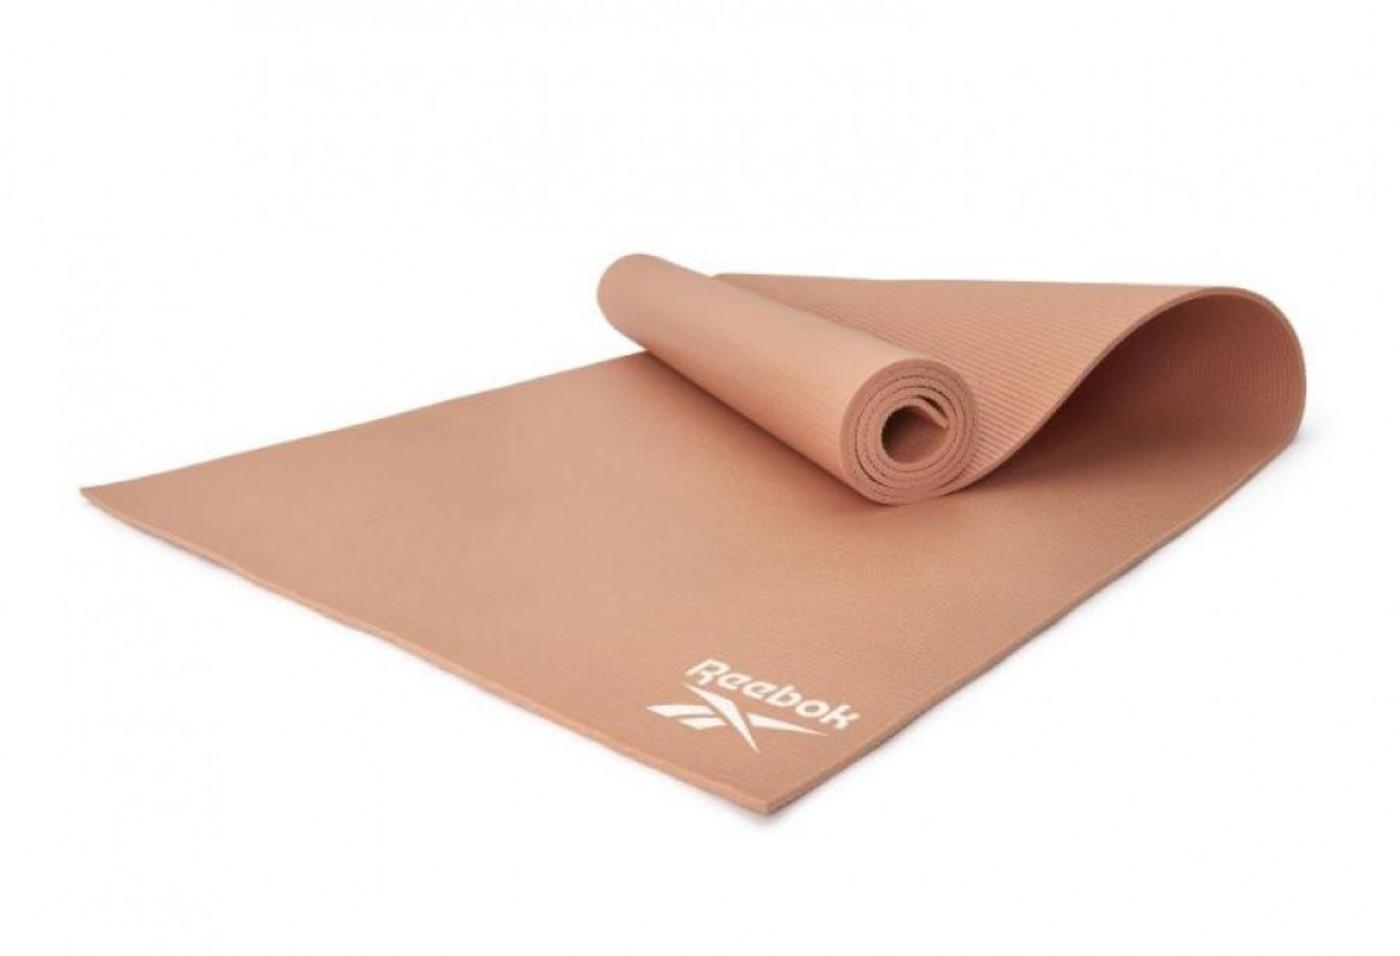 REEBOK Yoga Mat - 4mm